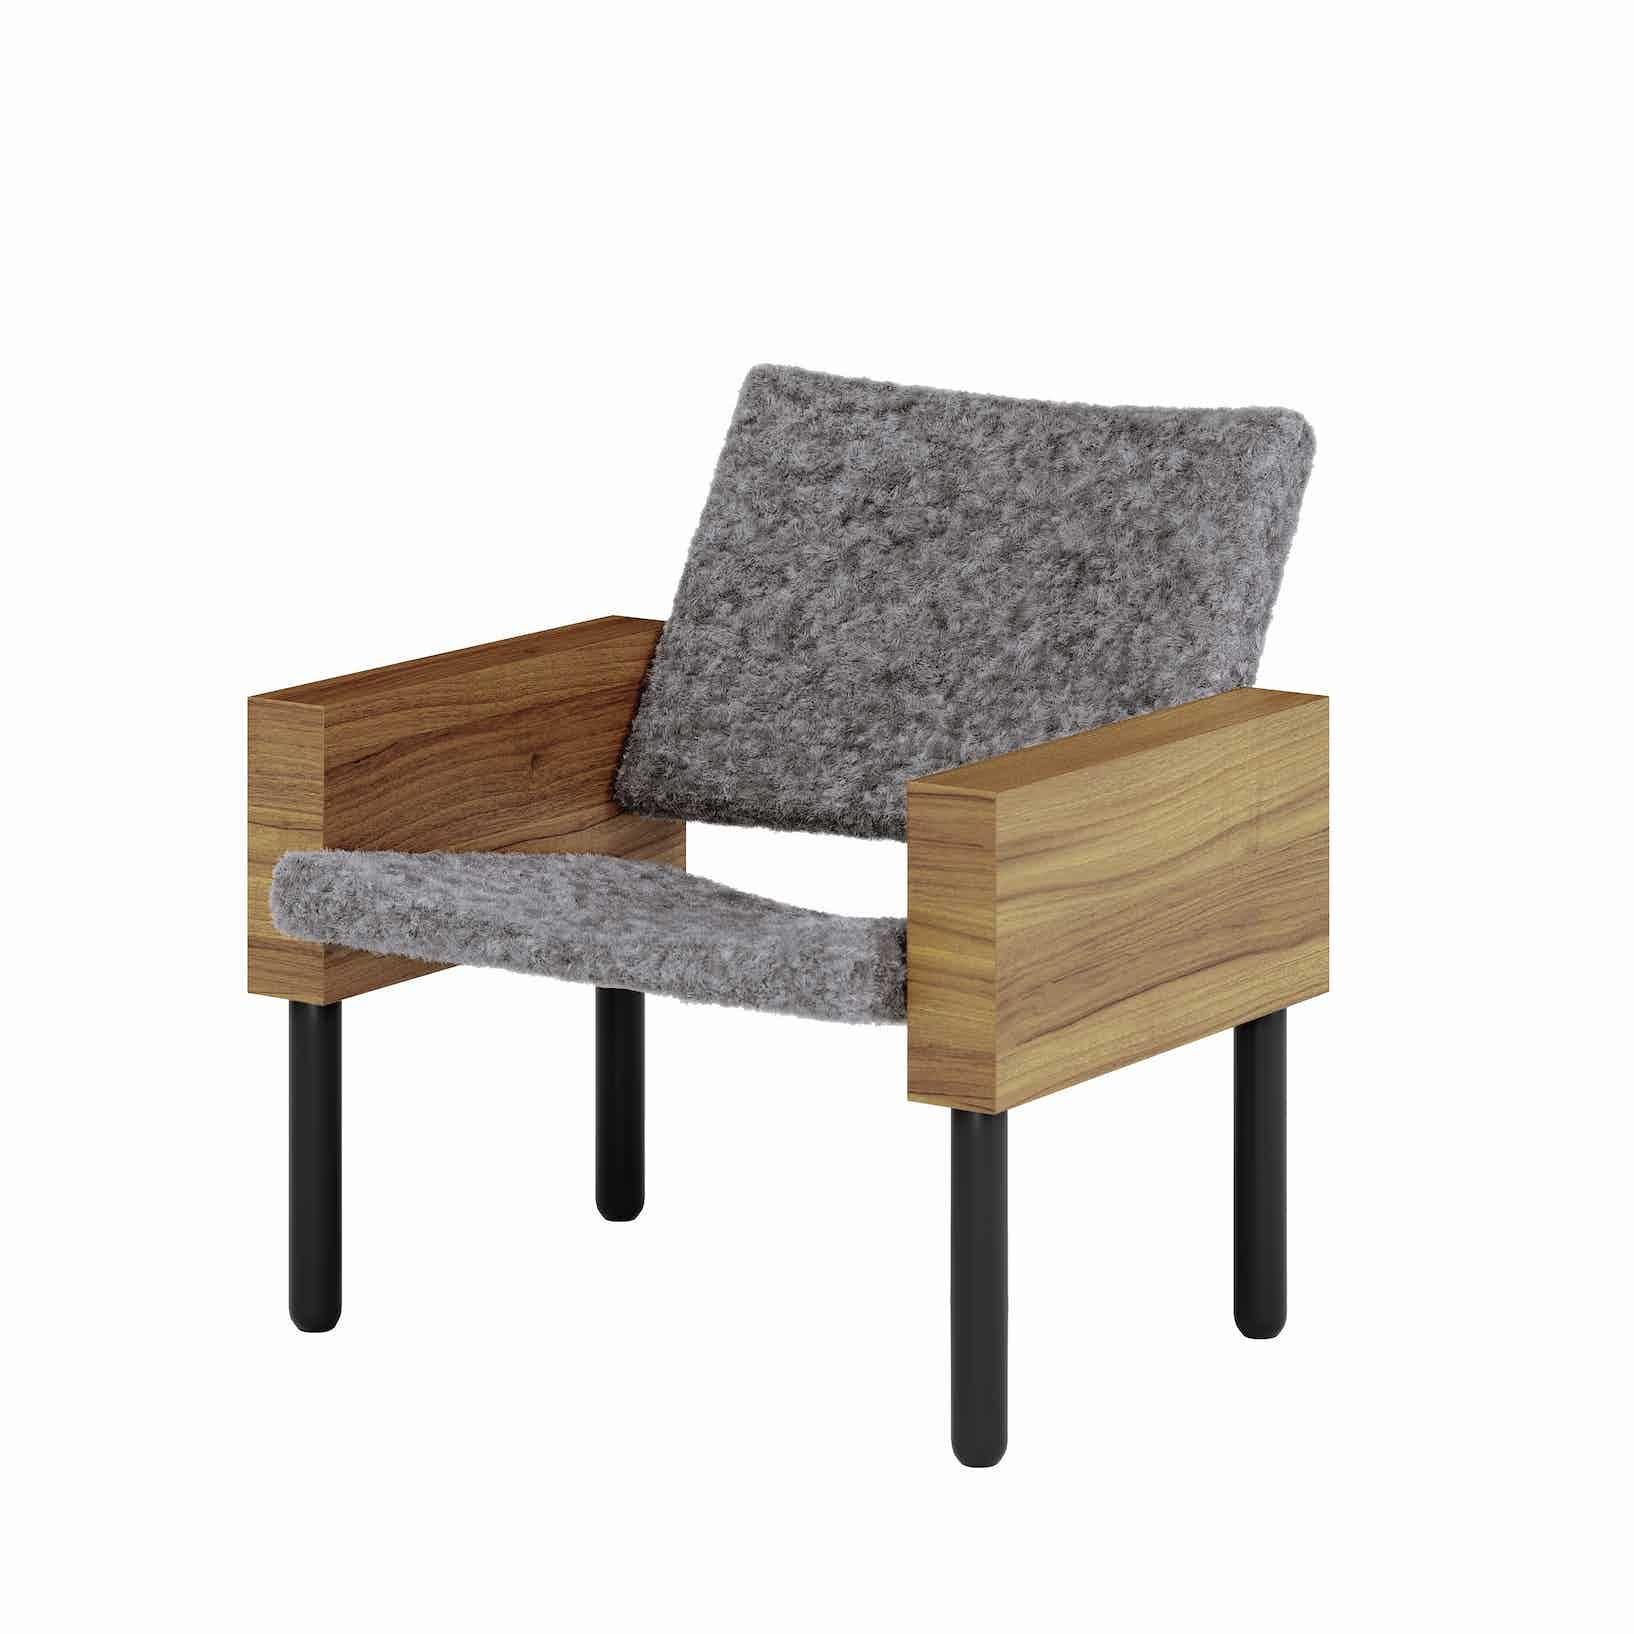 La-chance-furniture-block-armchair-grey-haute-living